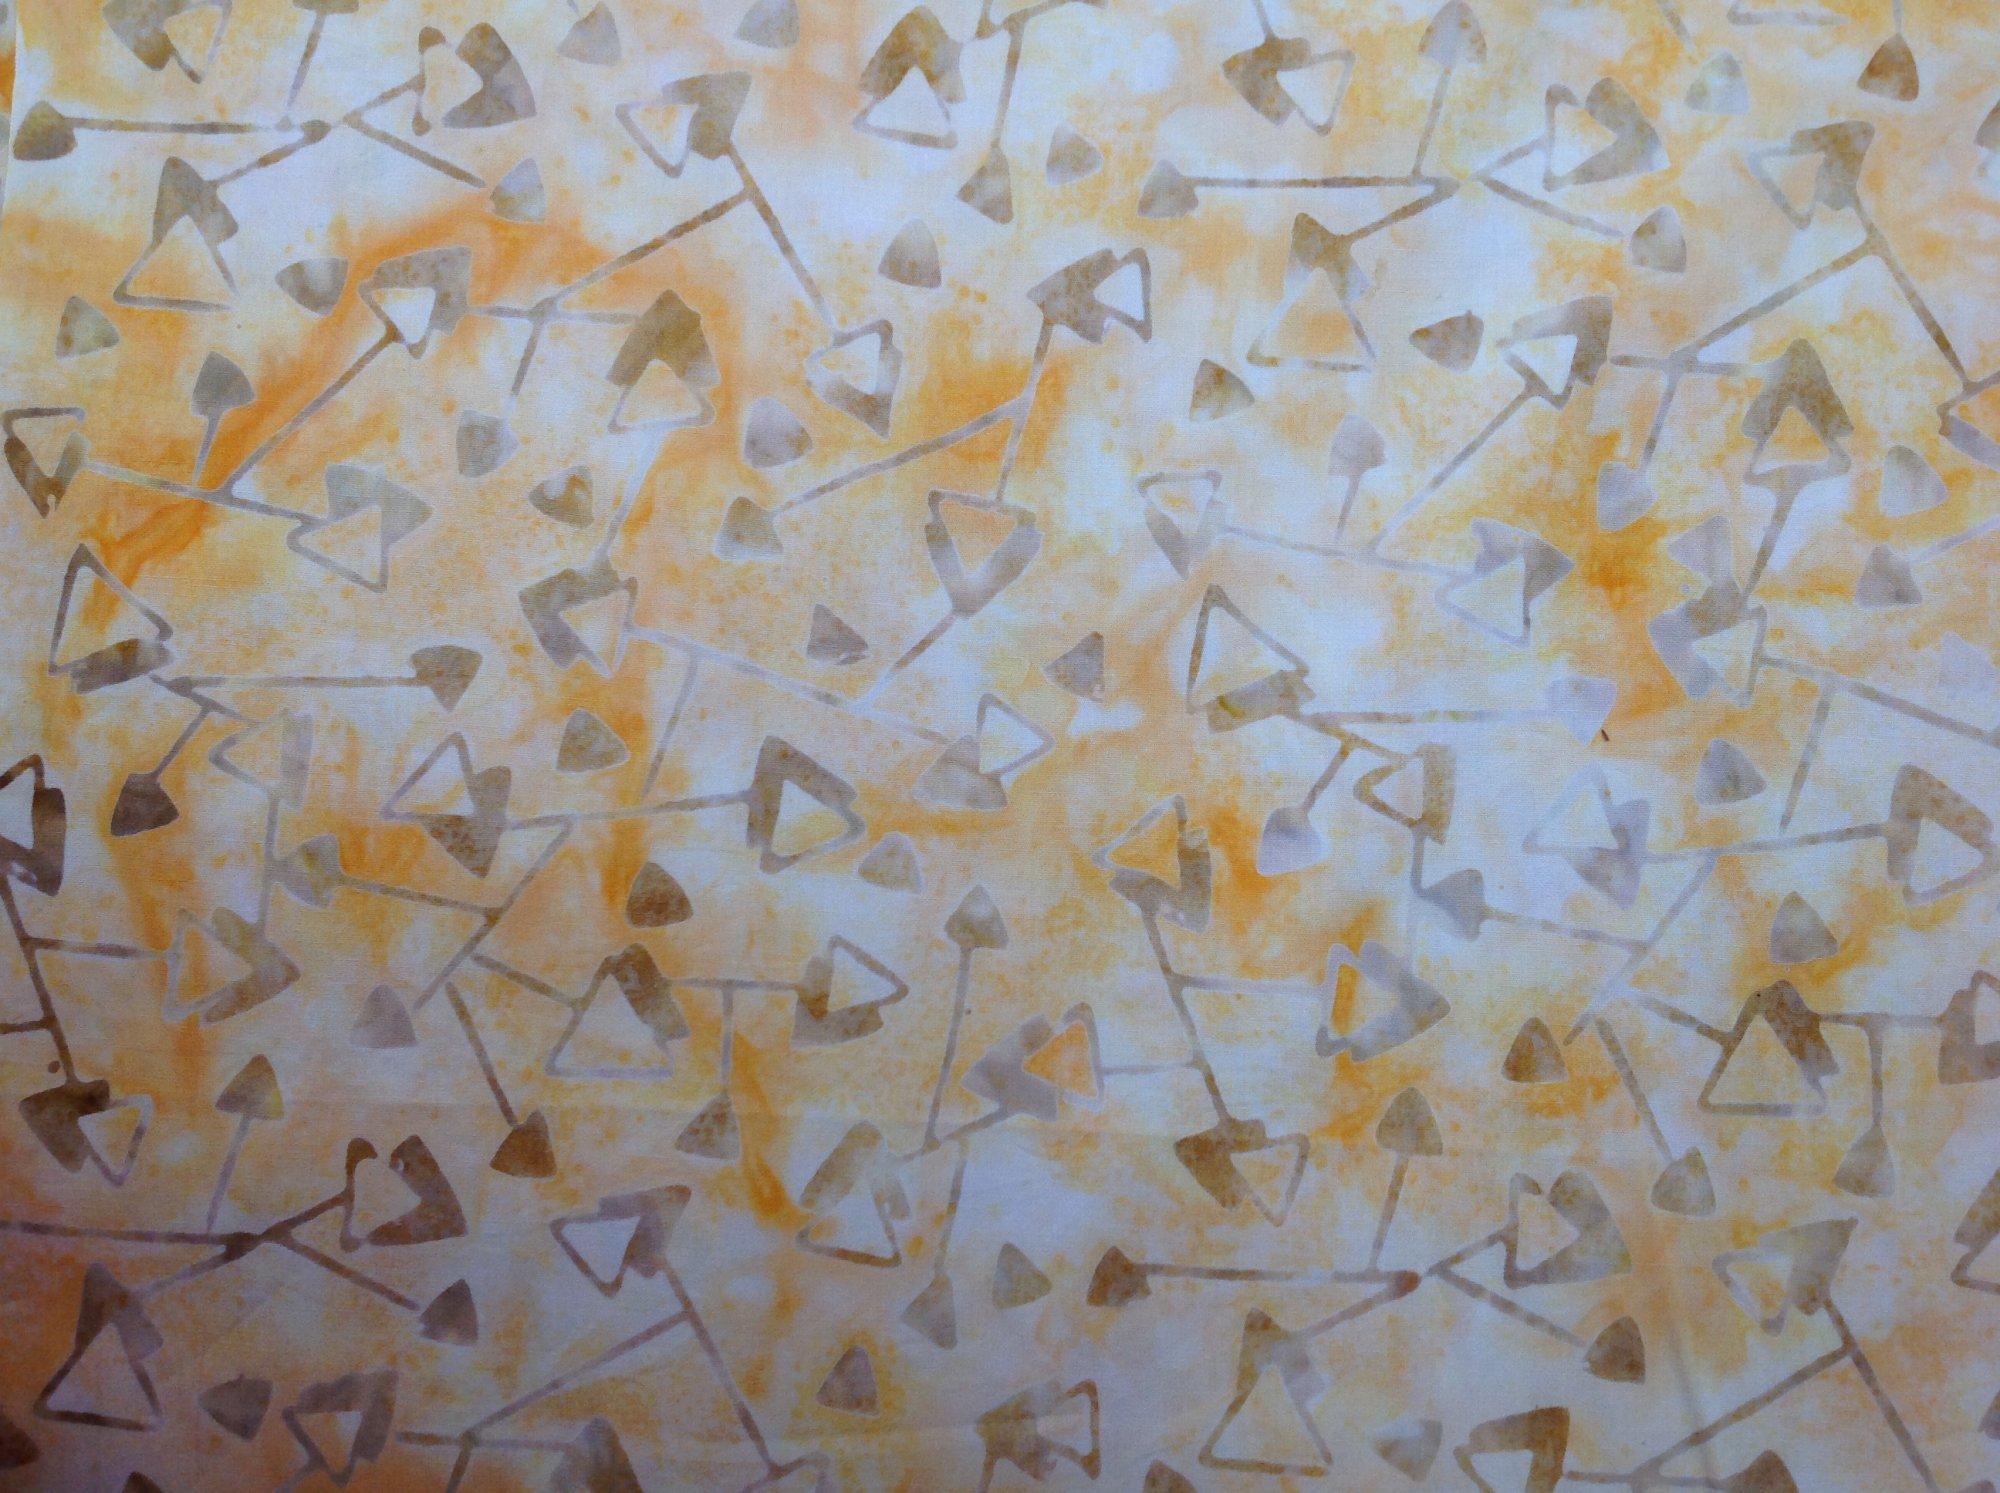 Taupe Triangles on Yellow/Orange Batik